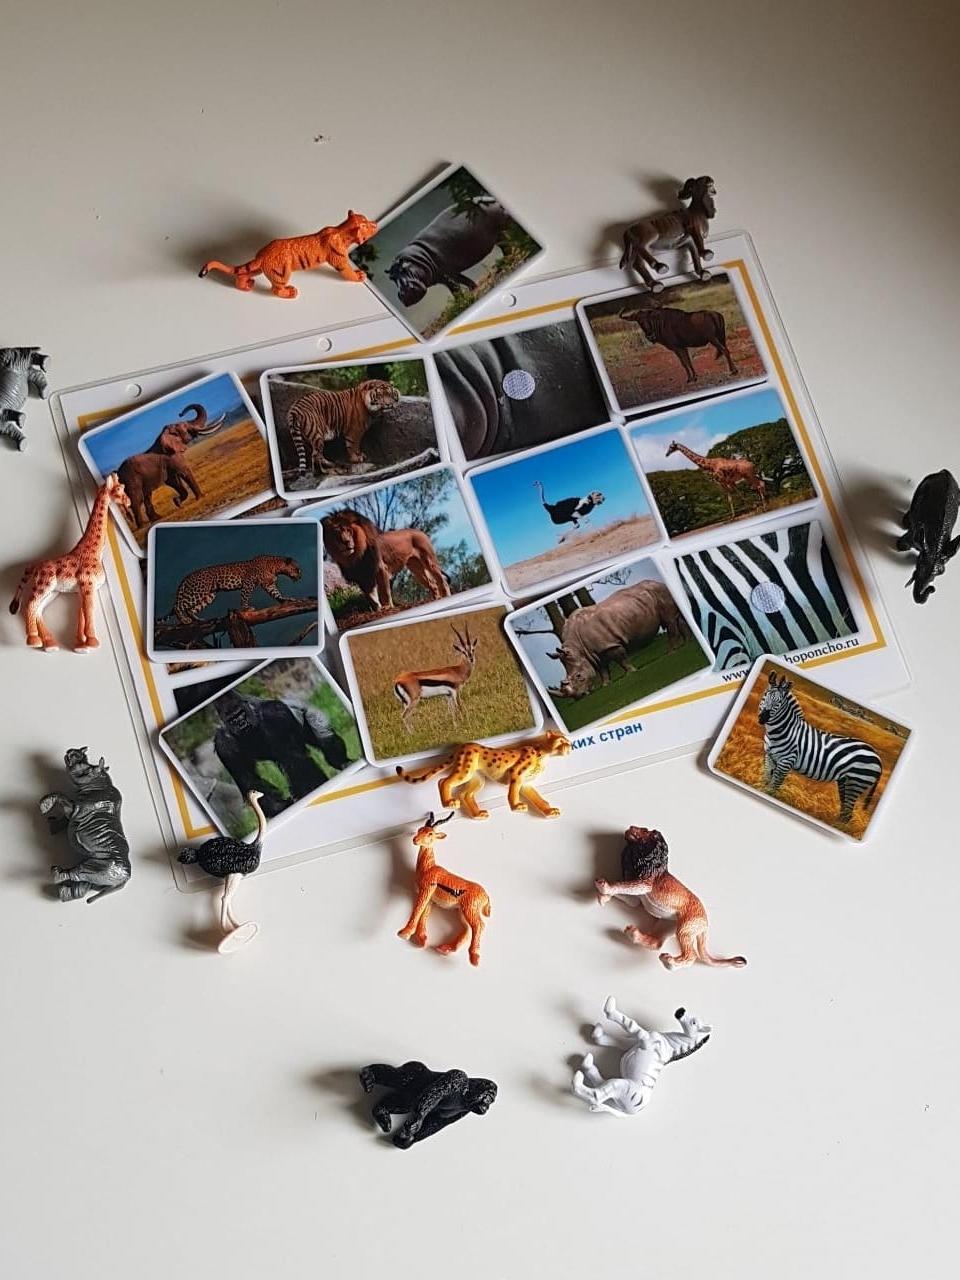 Животные Жарких Стран. Без фигурок. Развивающие пособия на липучках Frenchoponcho (Френчопончо)